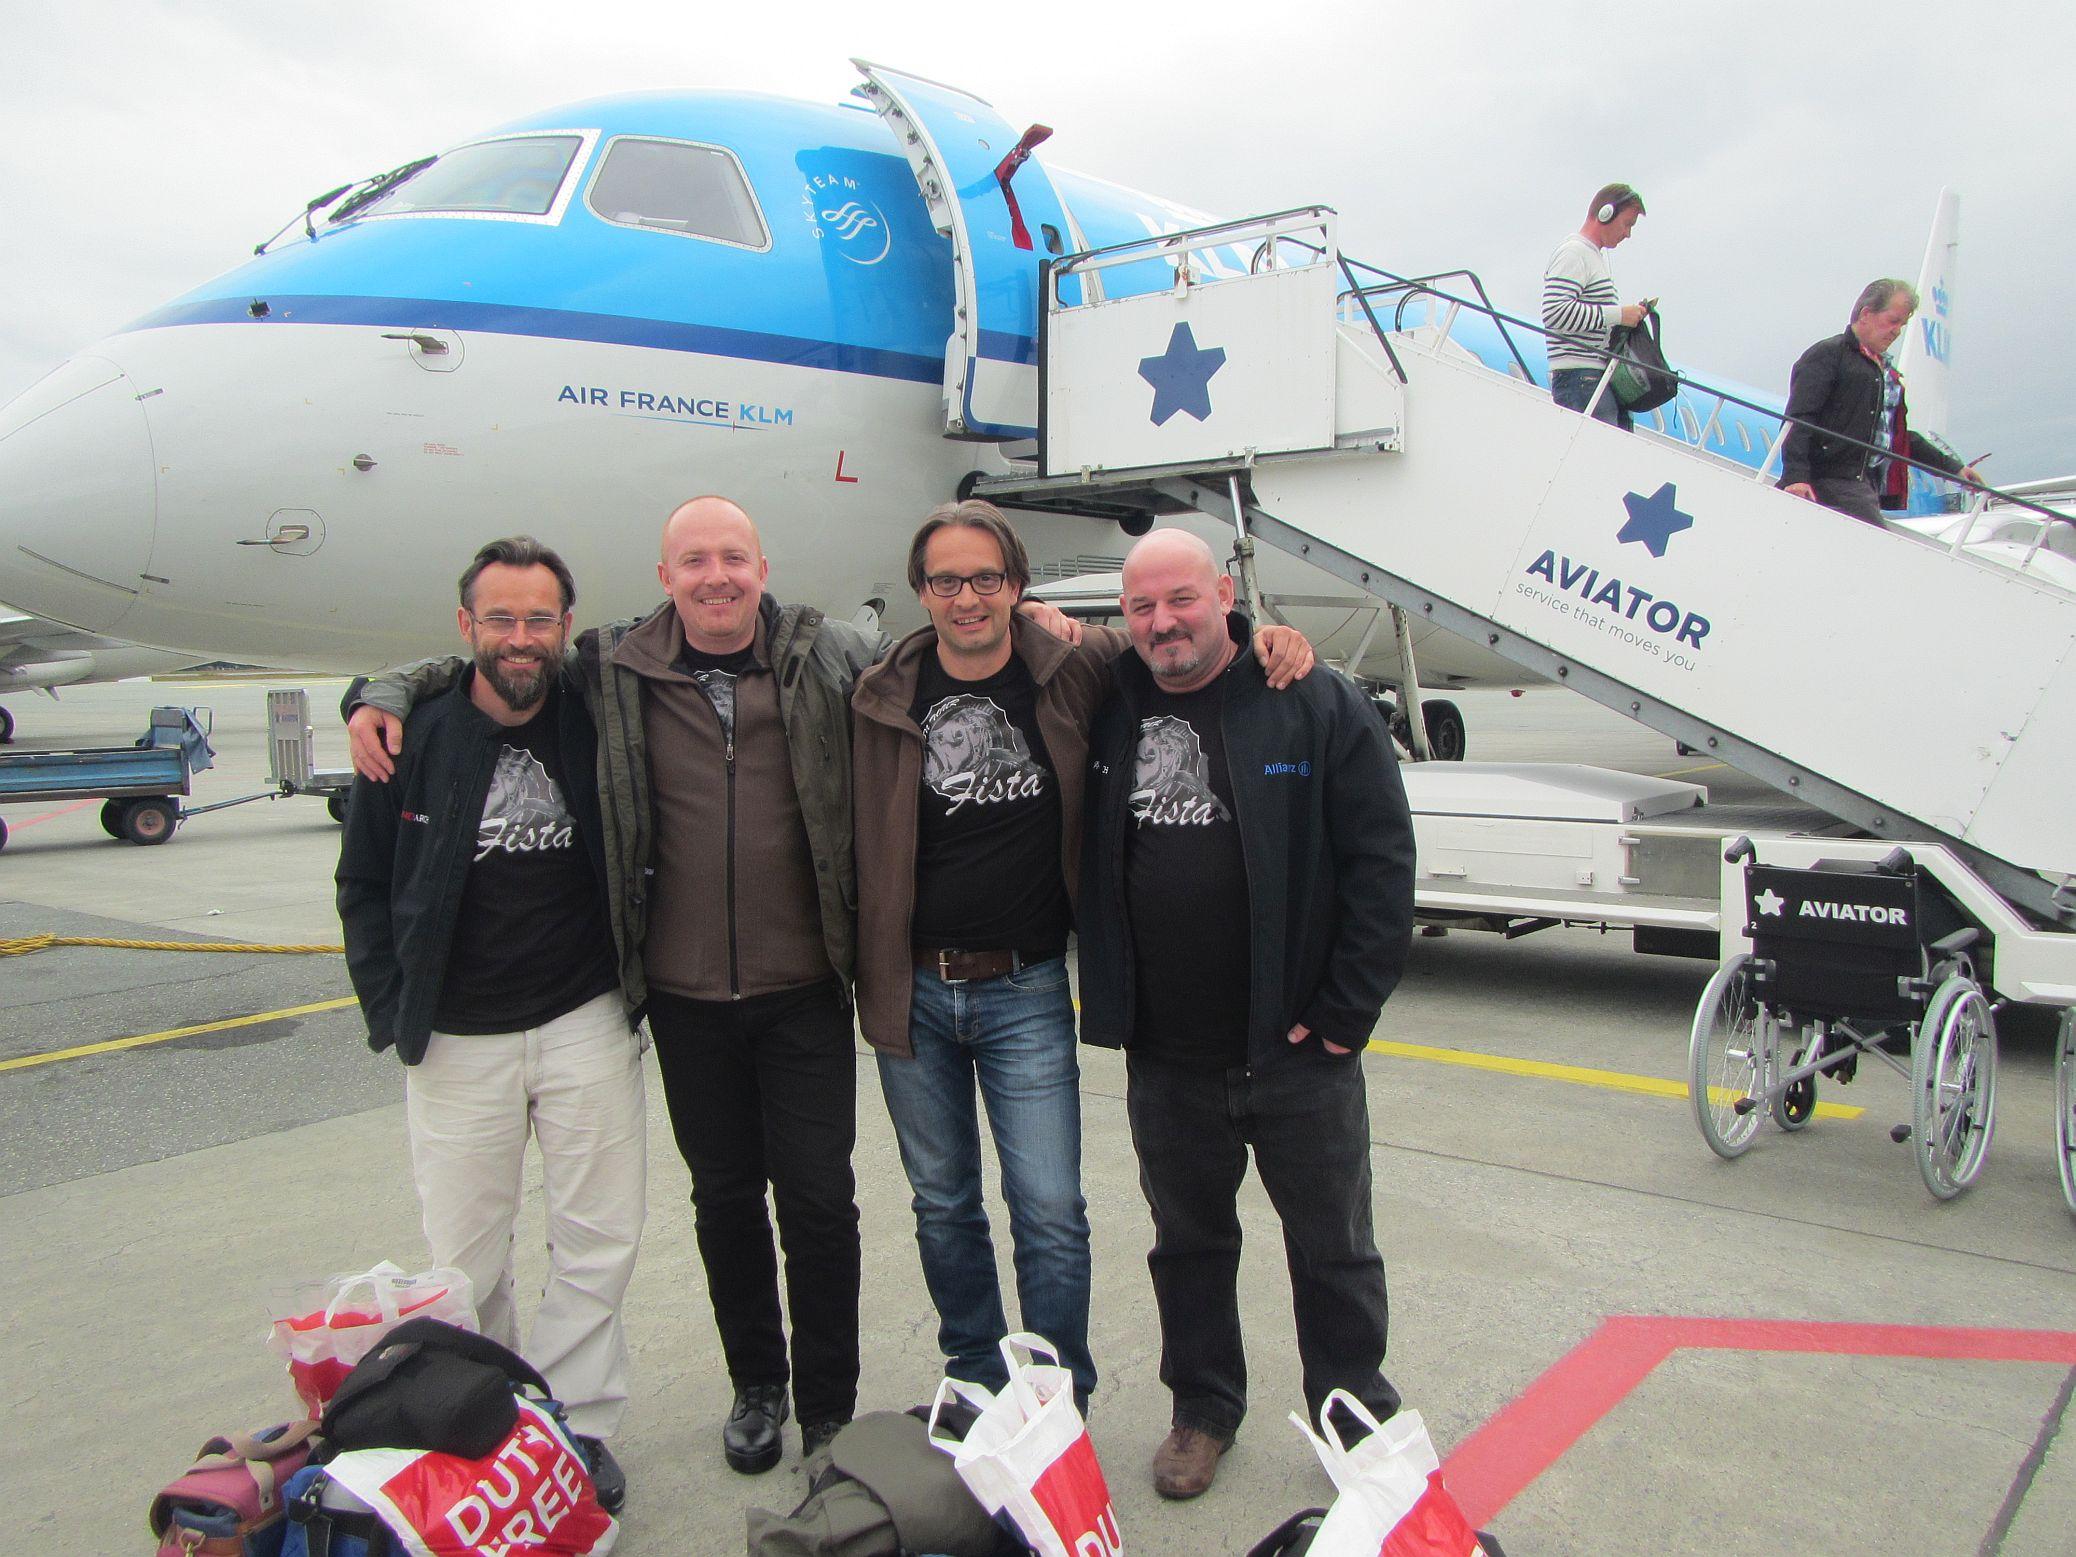 Team FLATANGER 2015 v.l.n.r.: Jürgen, Willi, Rudi und Max